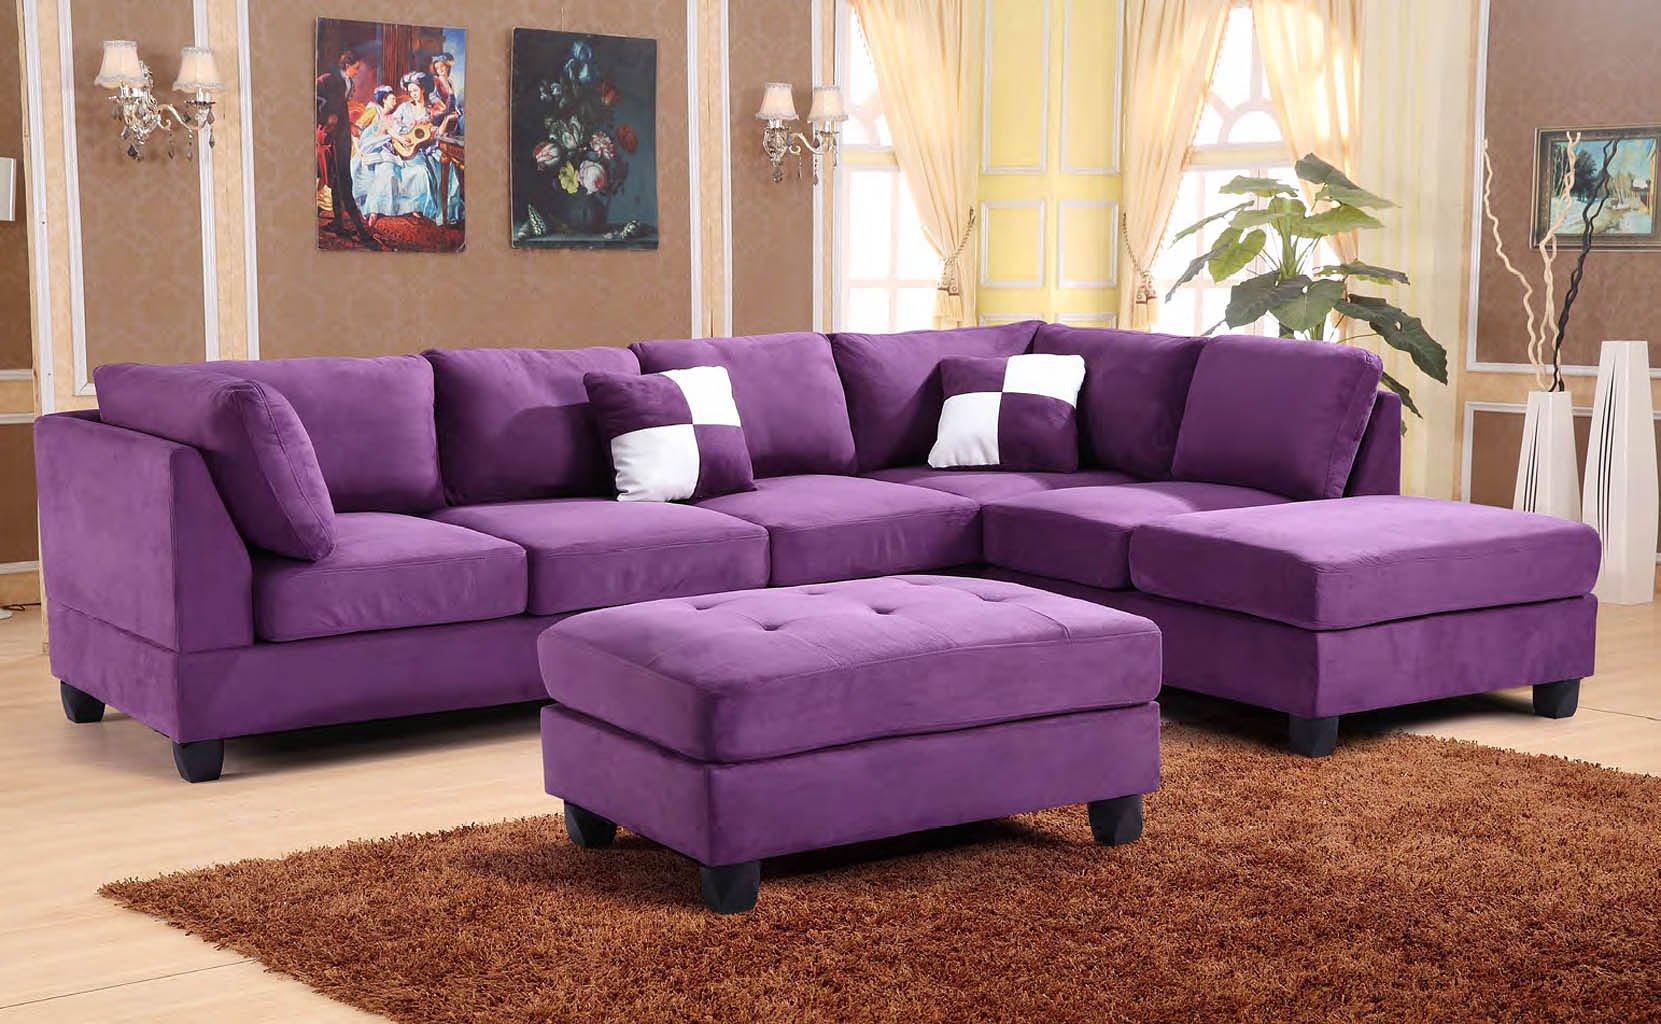 G637 Reversible Sectional Set (Purple)